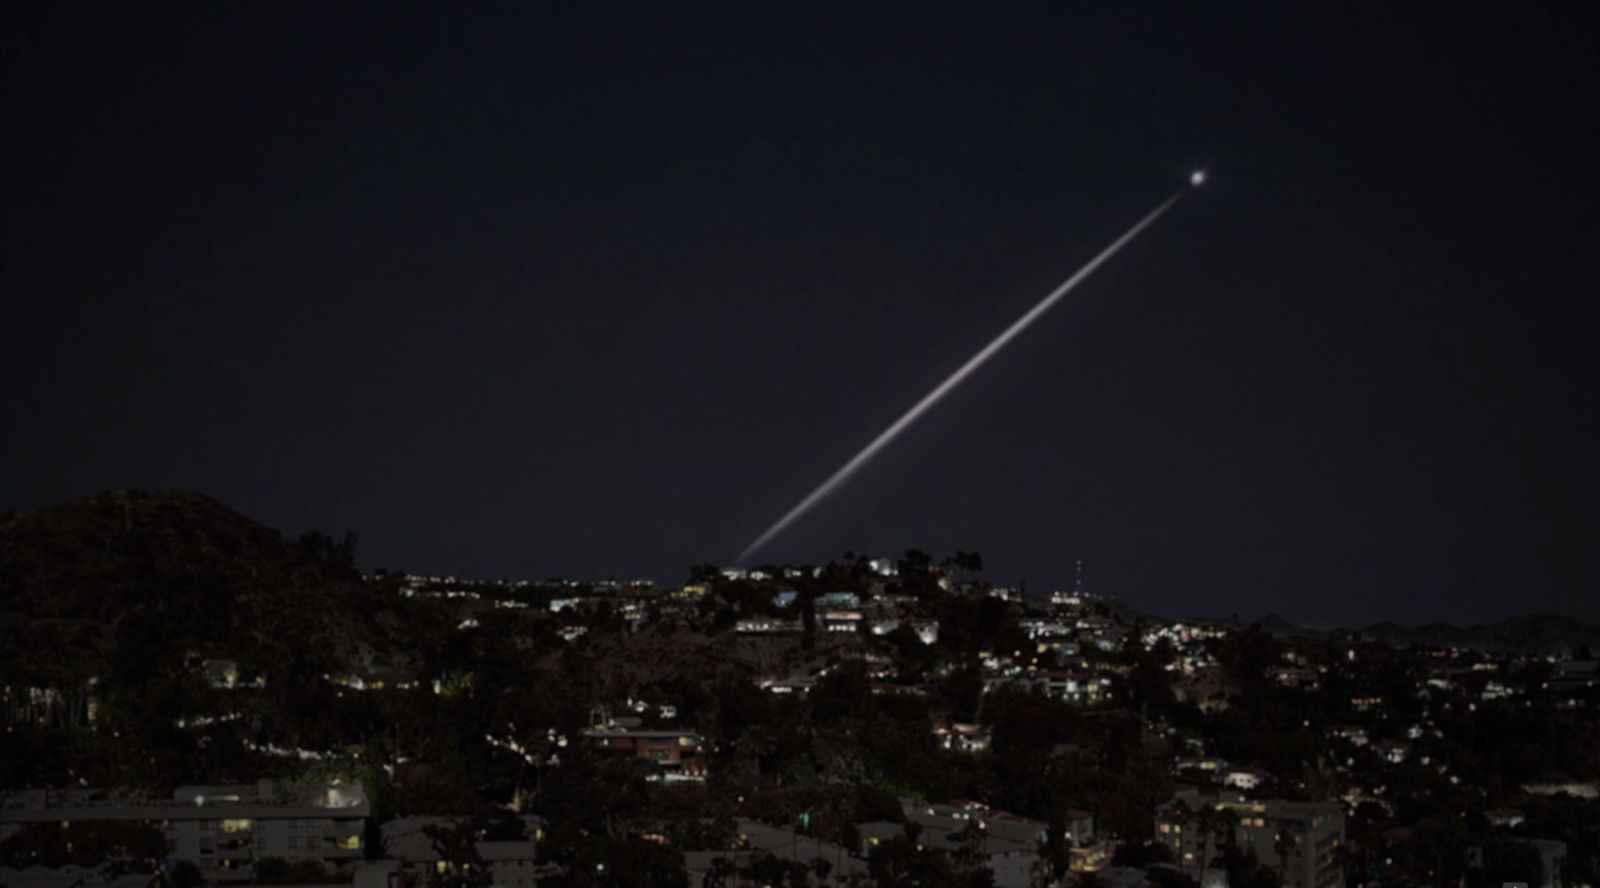 9_dot_and_beam_over_LA.jpg